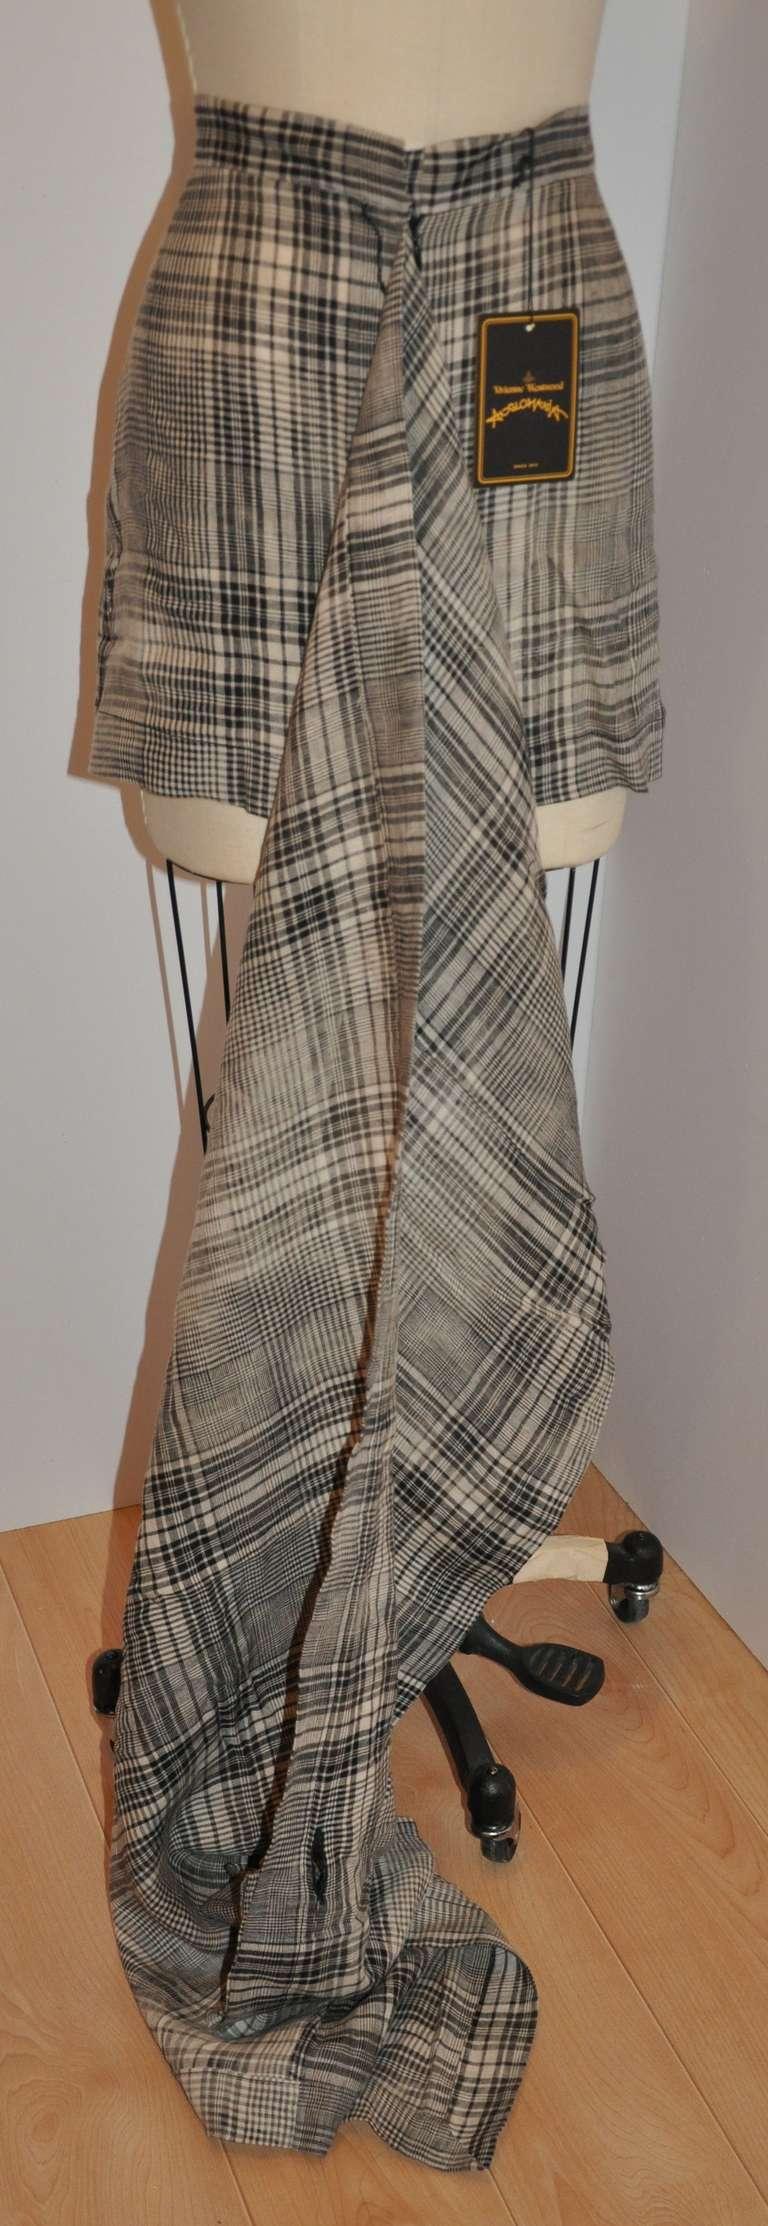 Gray Vivienne Westwood Black & White Linen Plaid Deconstructed Skirt For Sale